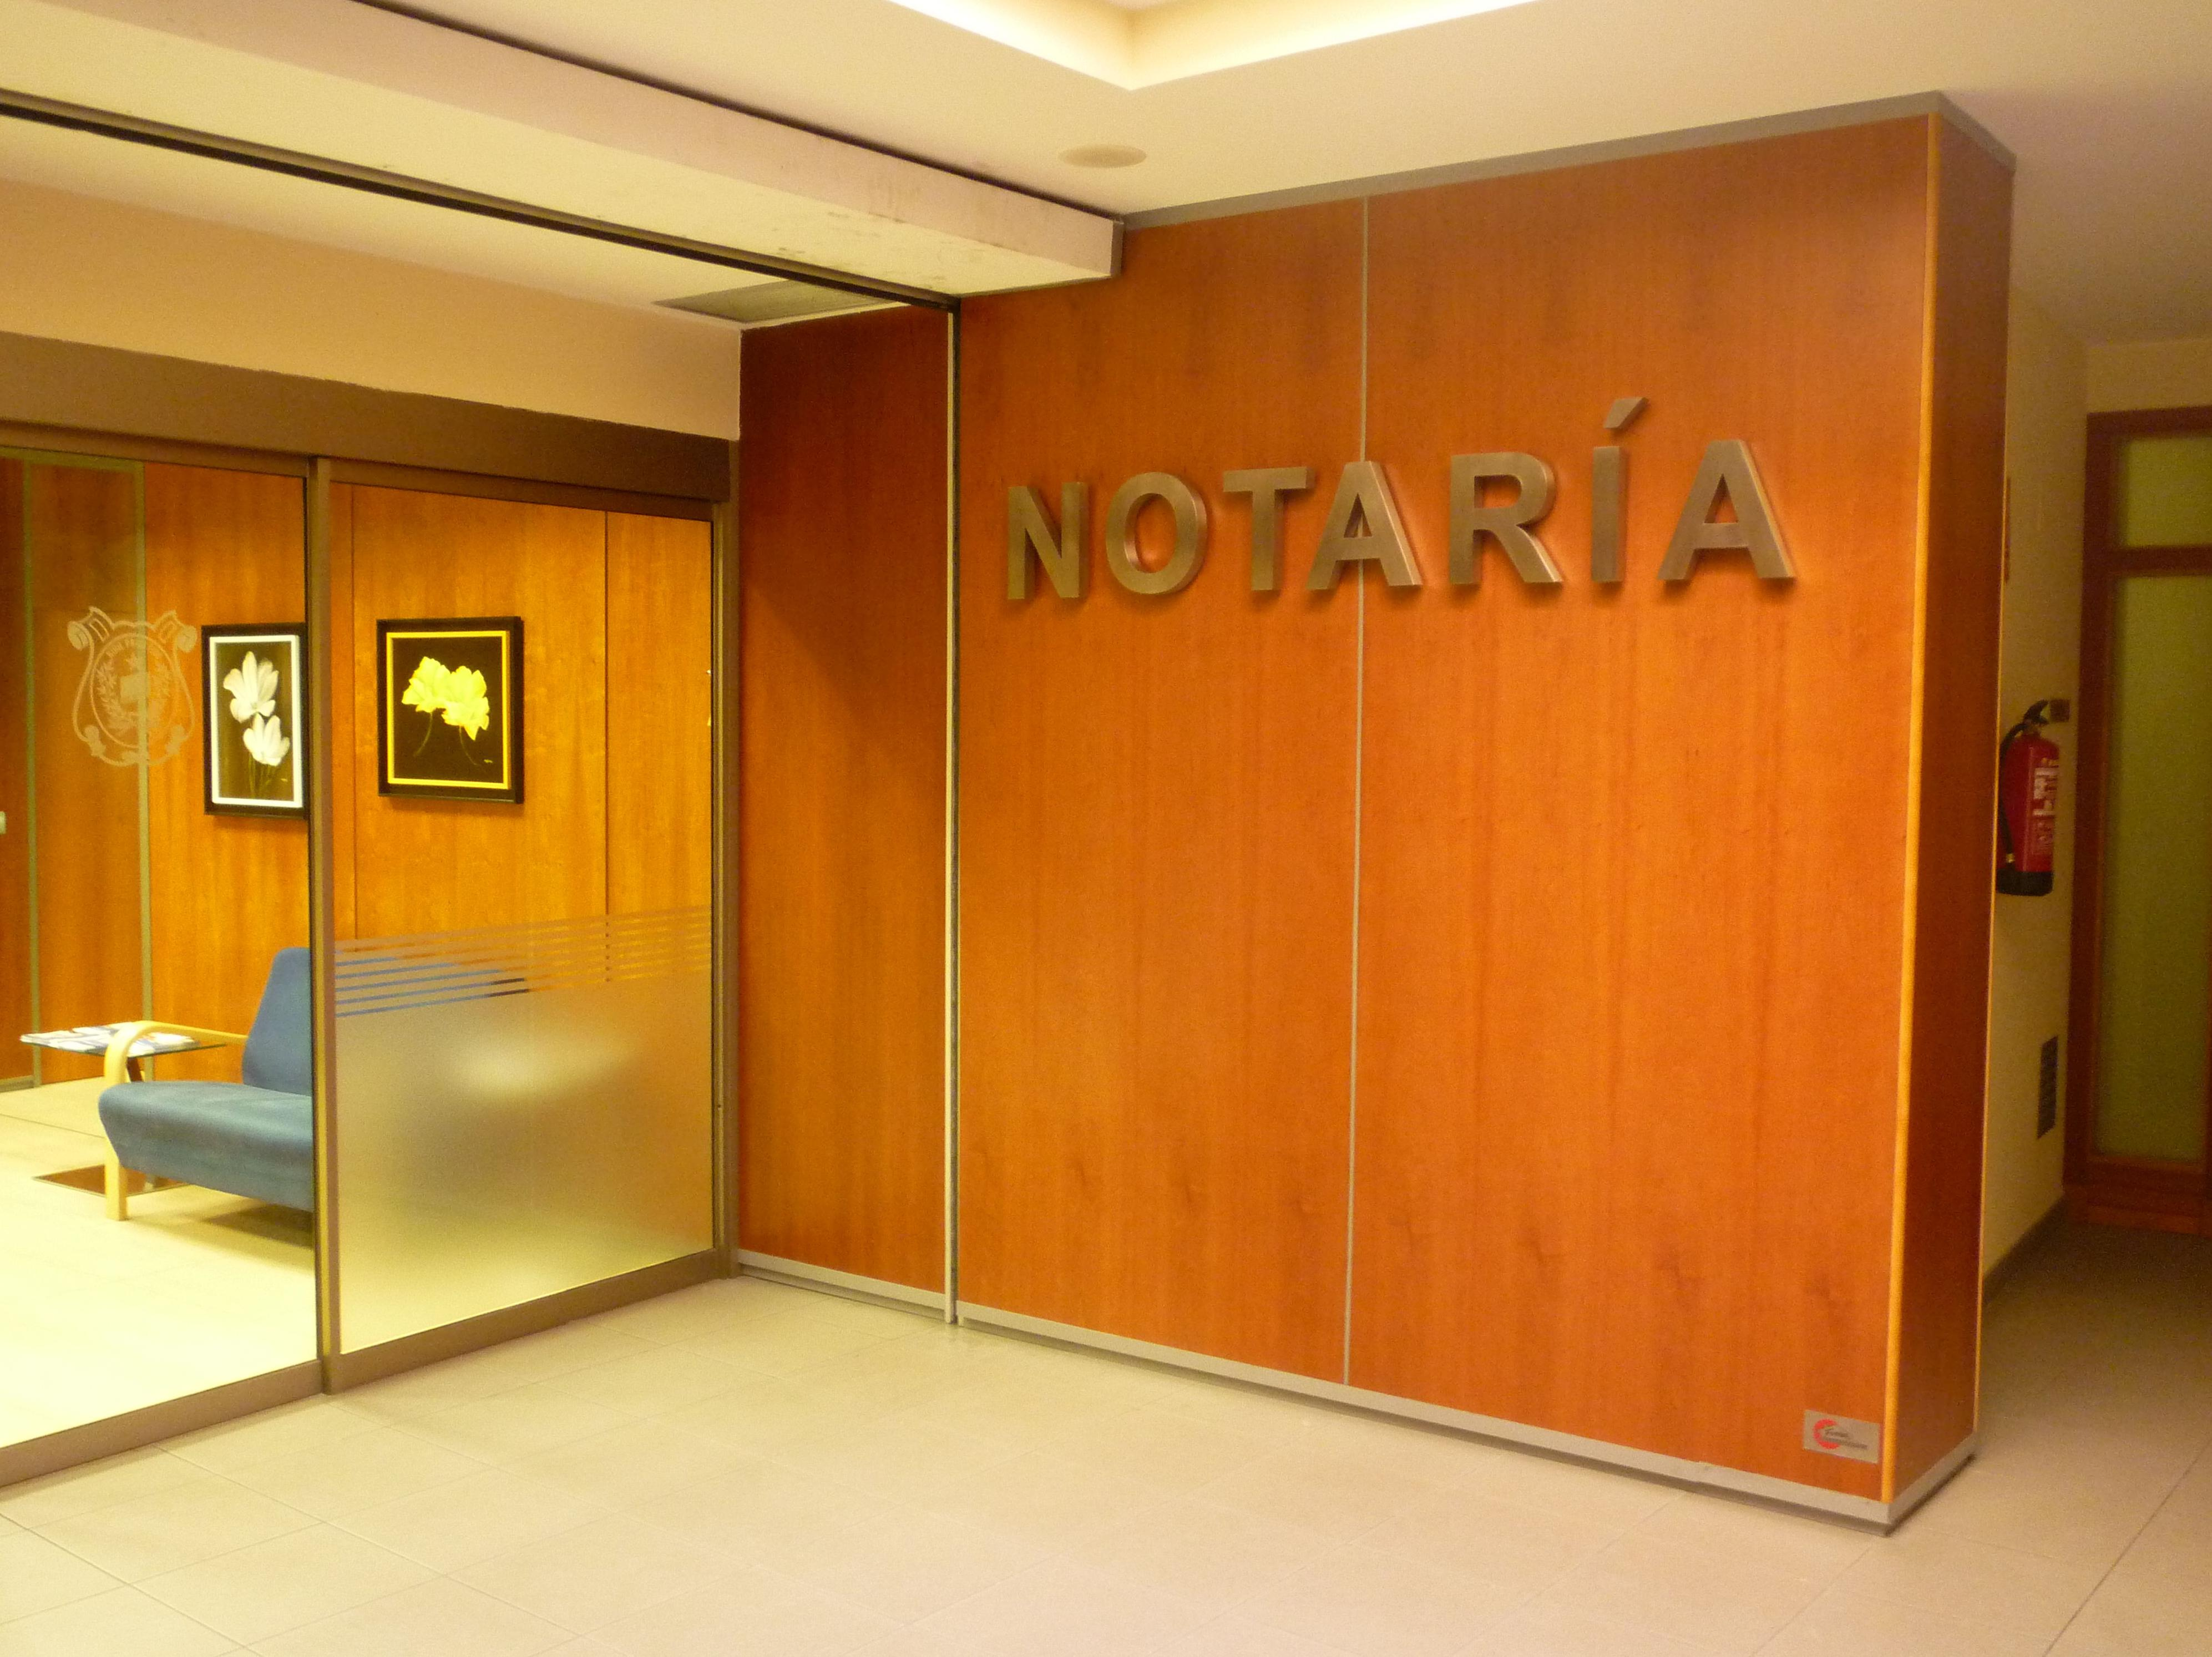 Anexo I del Arancel Notarial: Aranceles de Notario José Miguel Avello